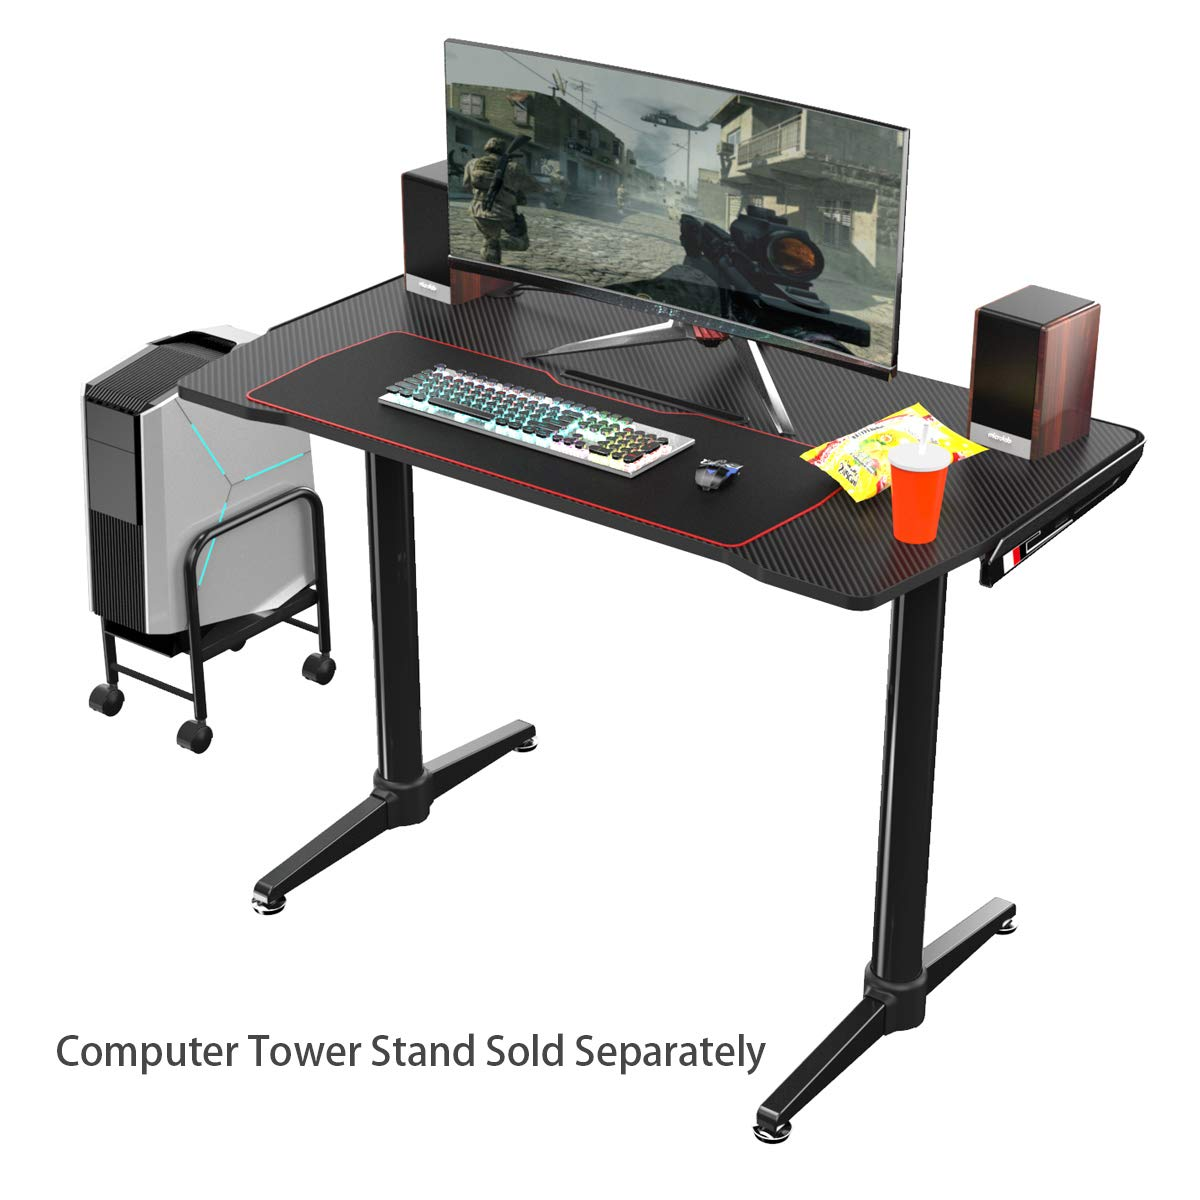 EUREKA ERGONOMIC I1 Gaming Desk 43.3 Home Office Computer PC Desk Gaming Tables Ergonomic Curve Design Desktop Cable Management for Men Boyfriend Female Gift